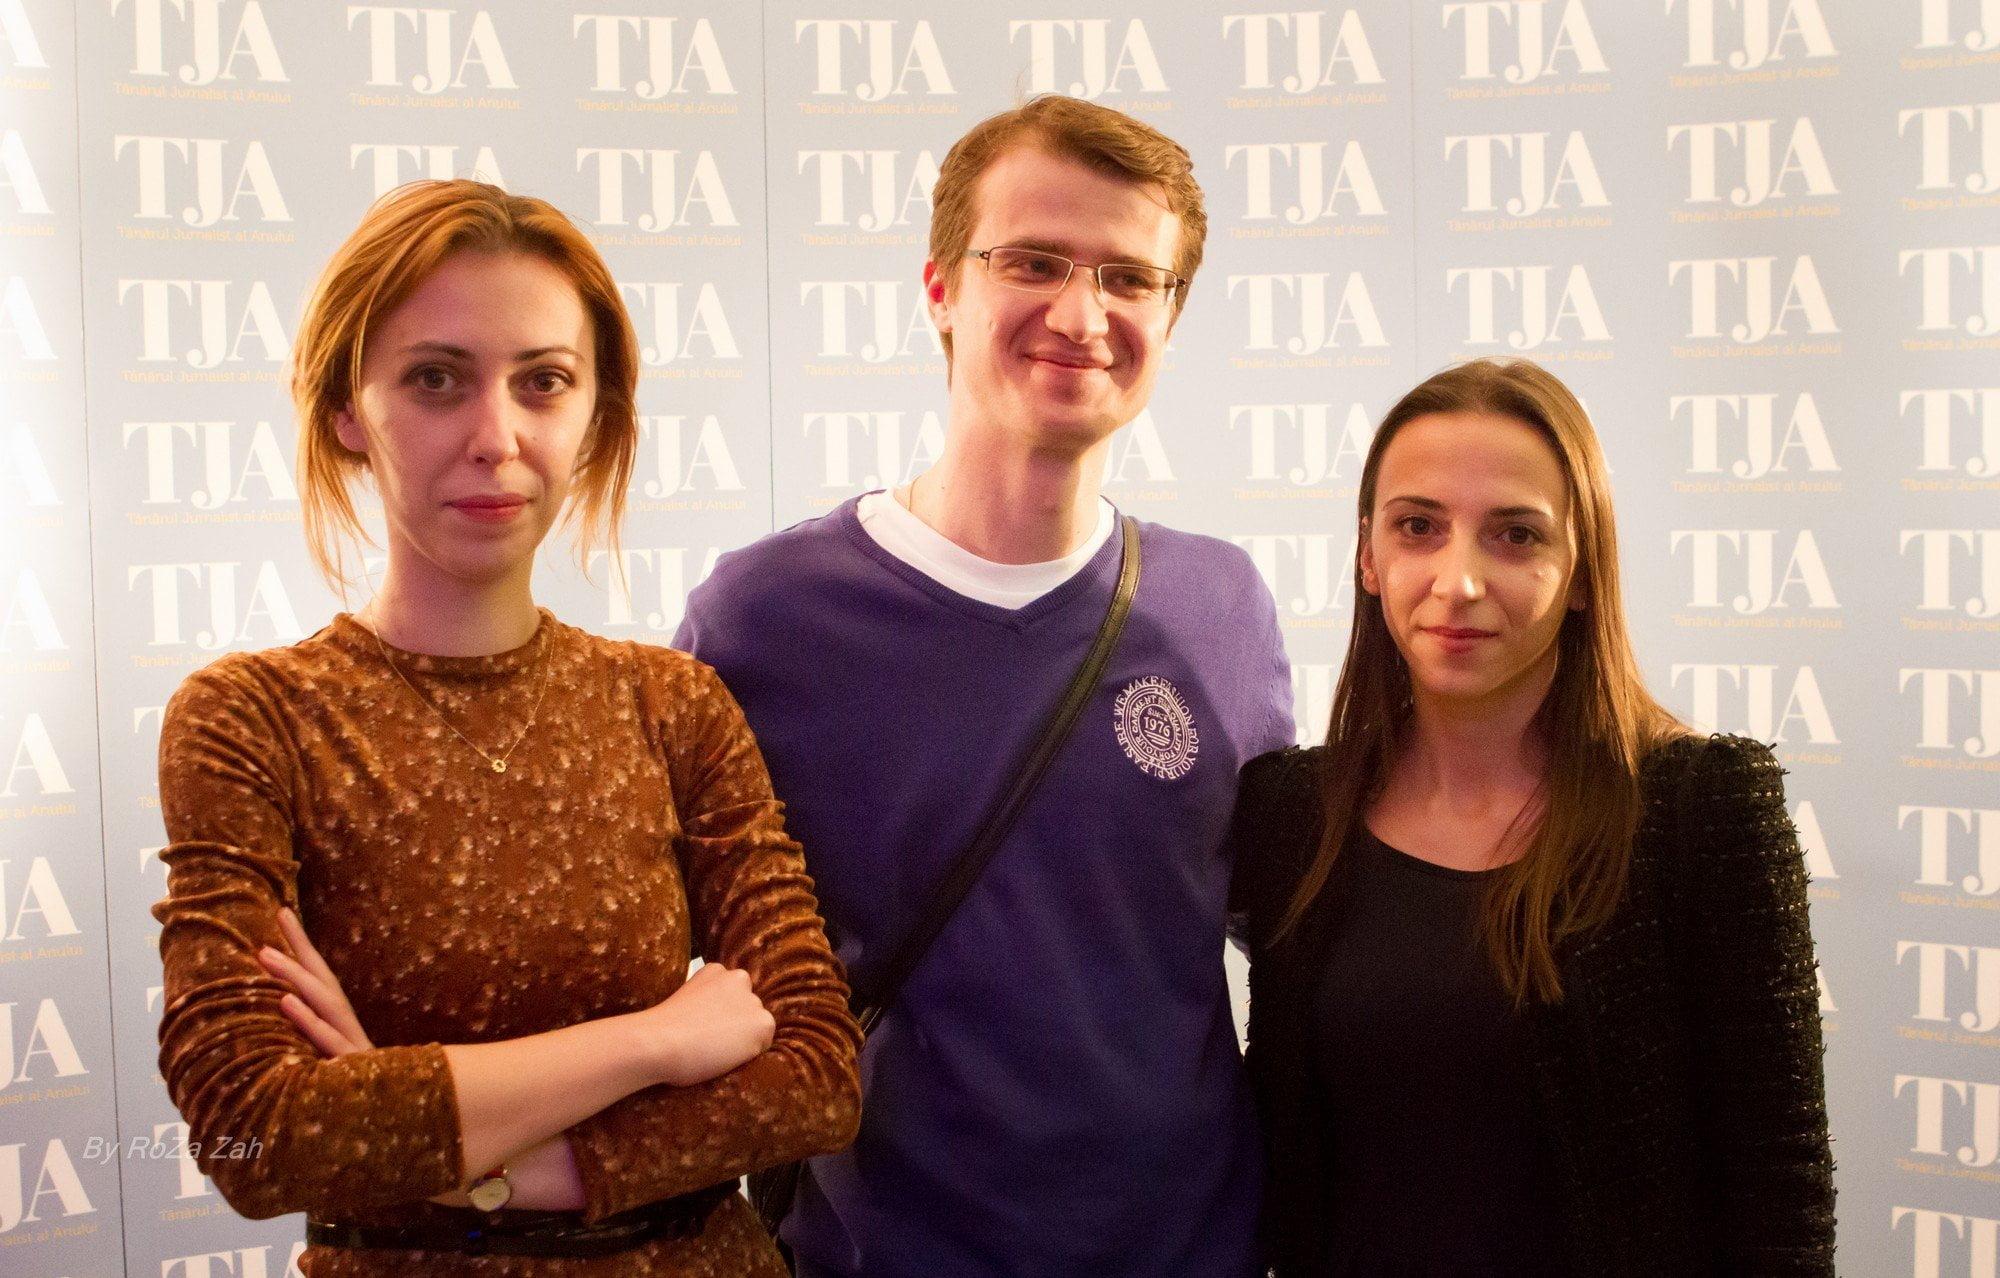 Roxana Pricop (Ziarul Financiar), Claudiu Zamfir (HotNews.ro) și Elena Constantinescu (UniCredit Țiriac Bank)